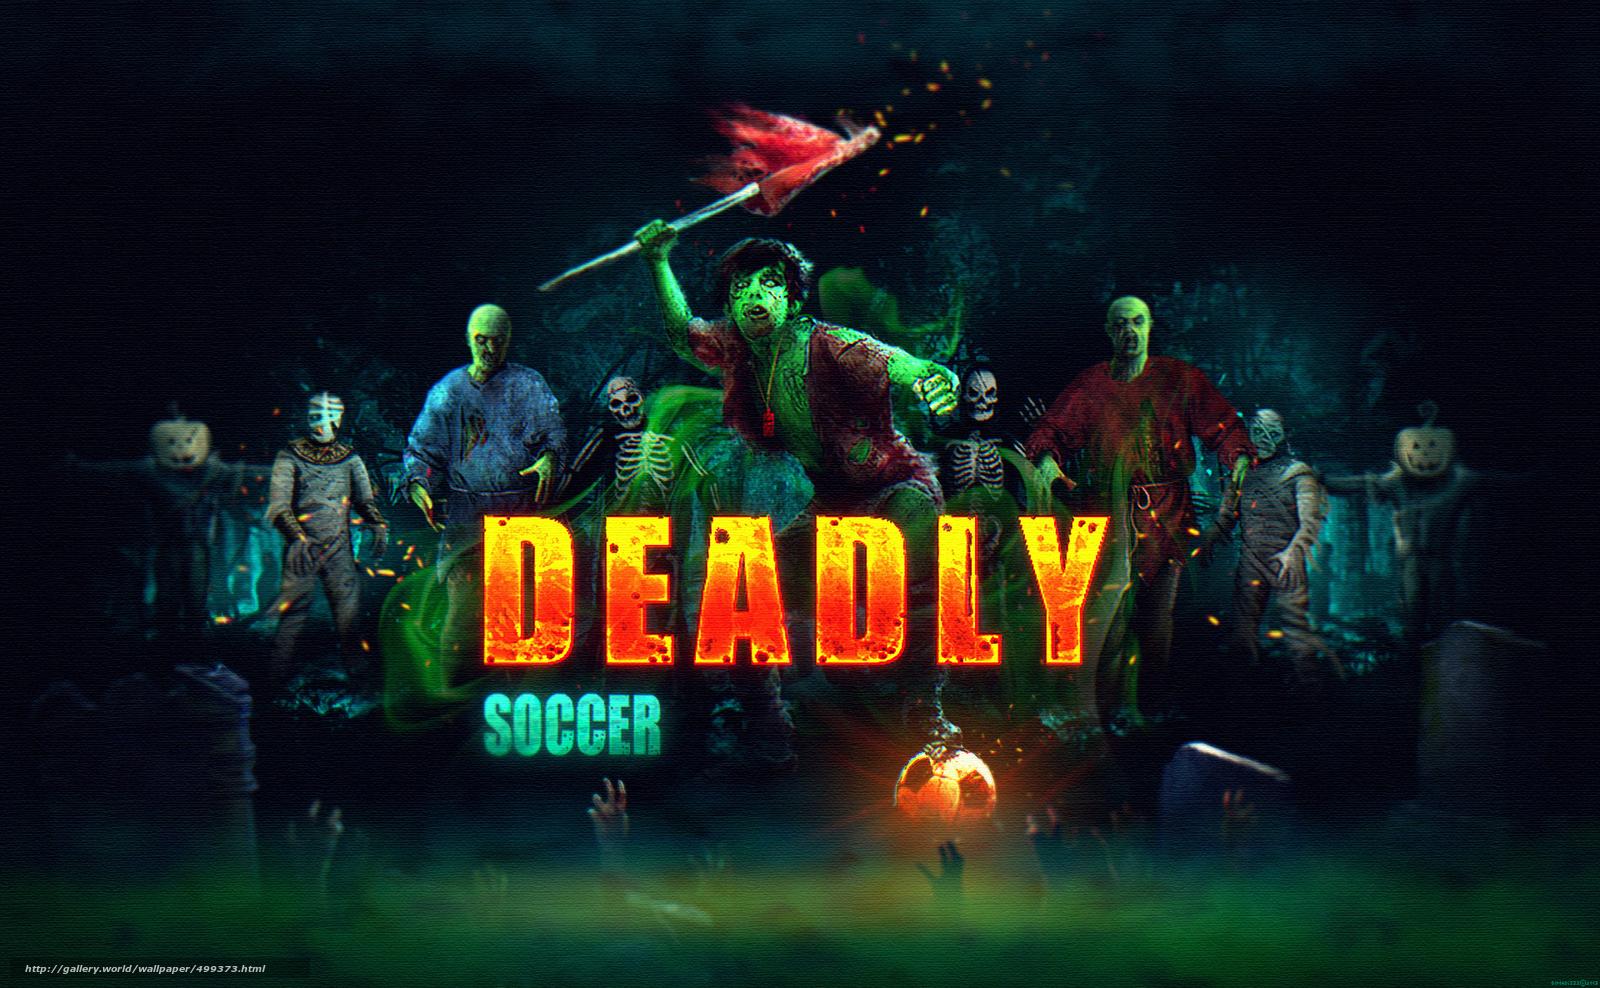 Download wallpaper dimadiz deadly soccer iphone ipad games 1600x988